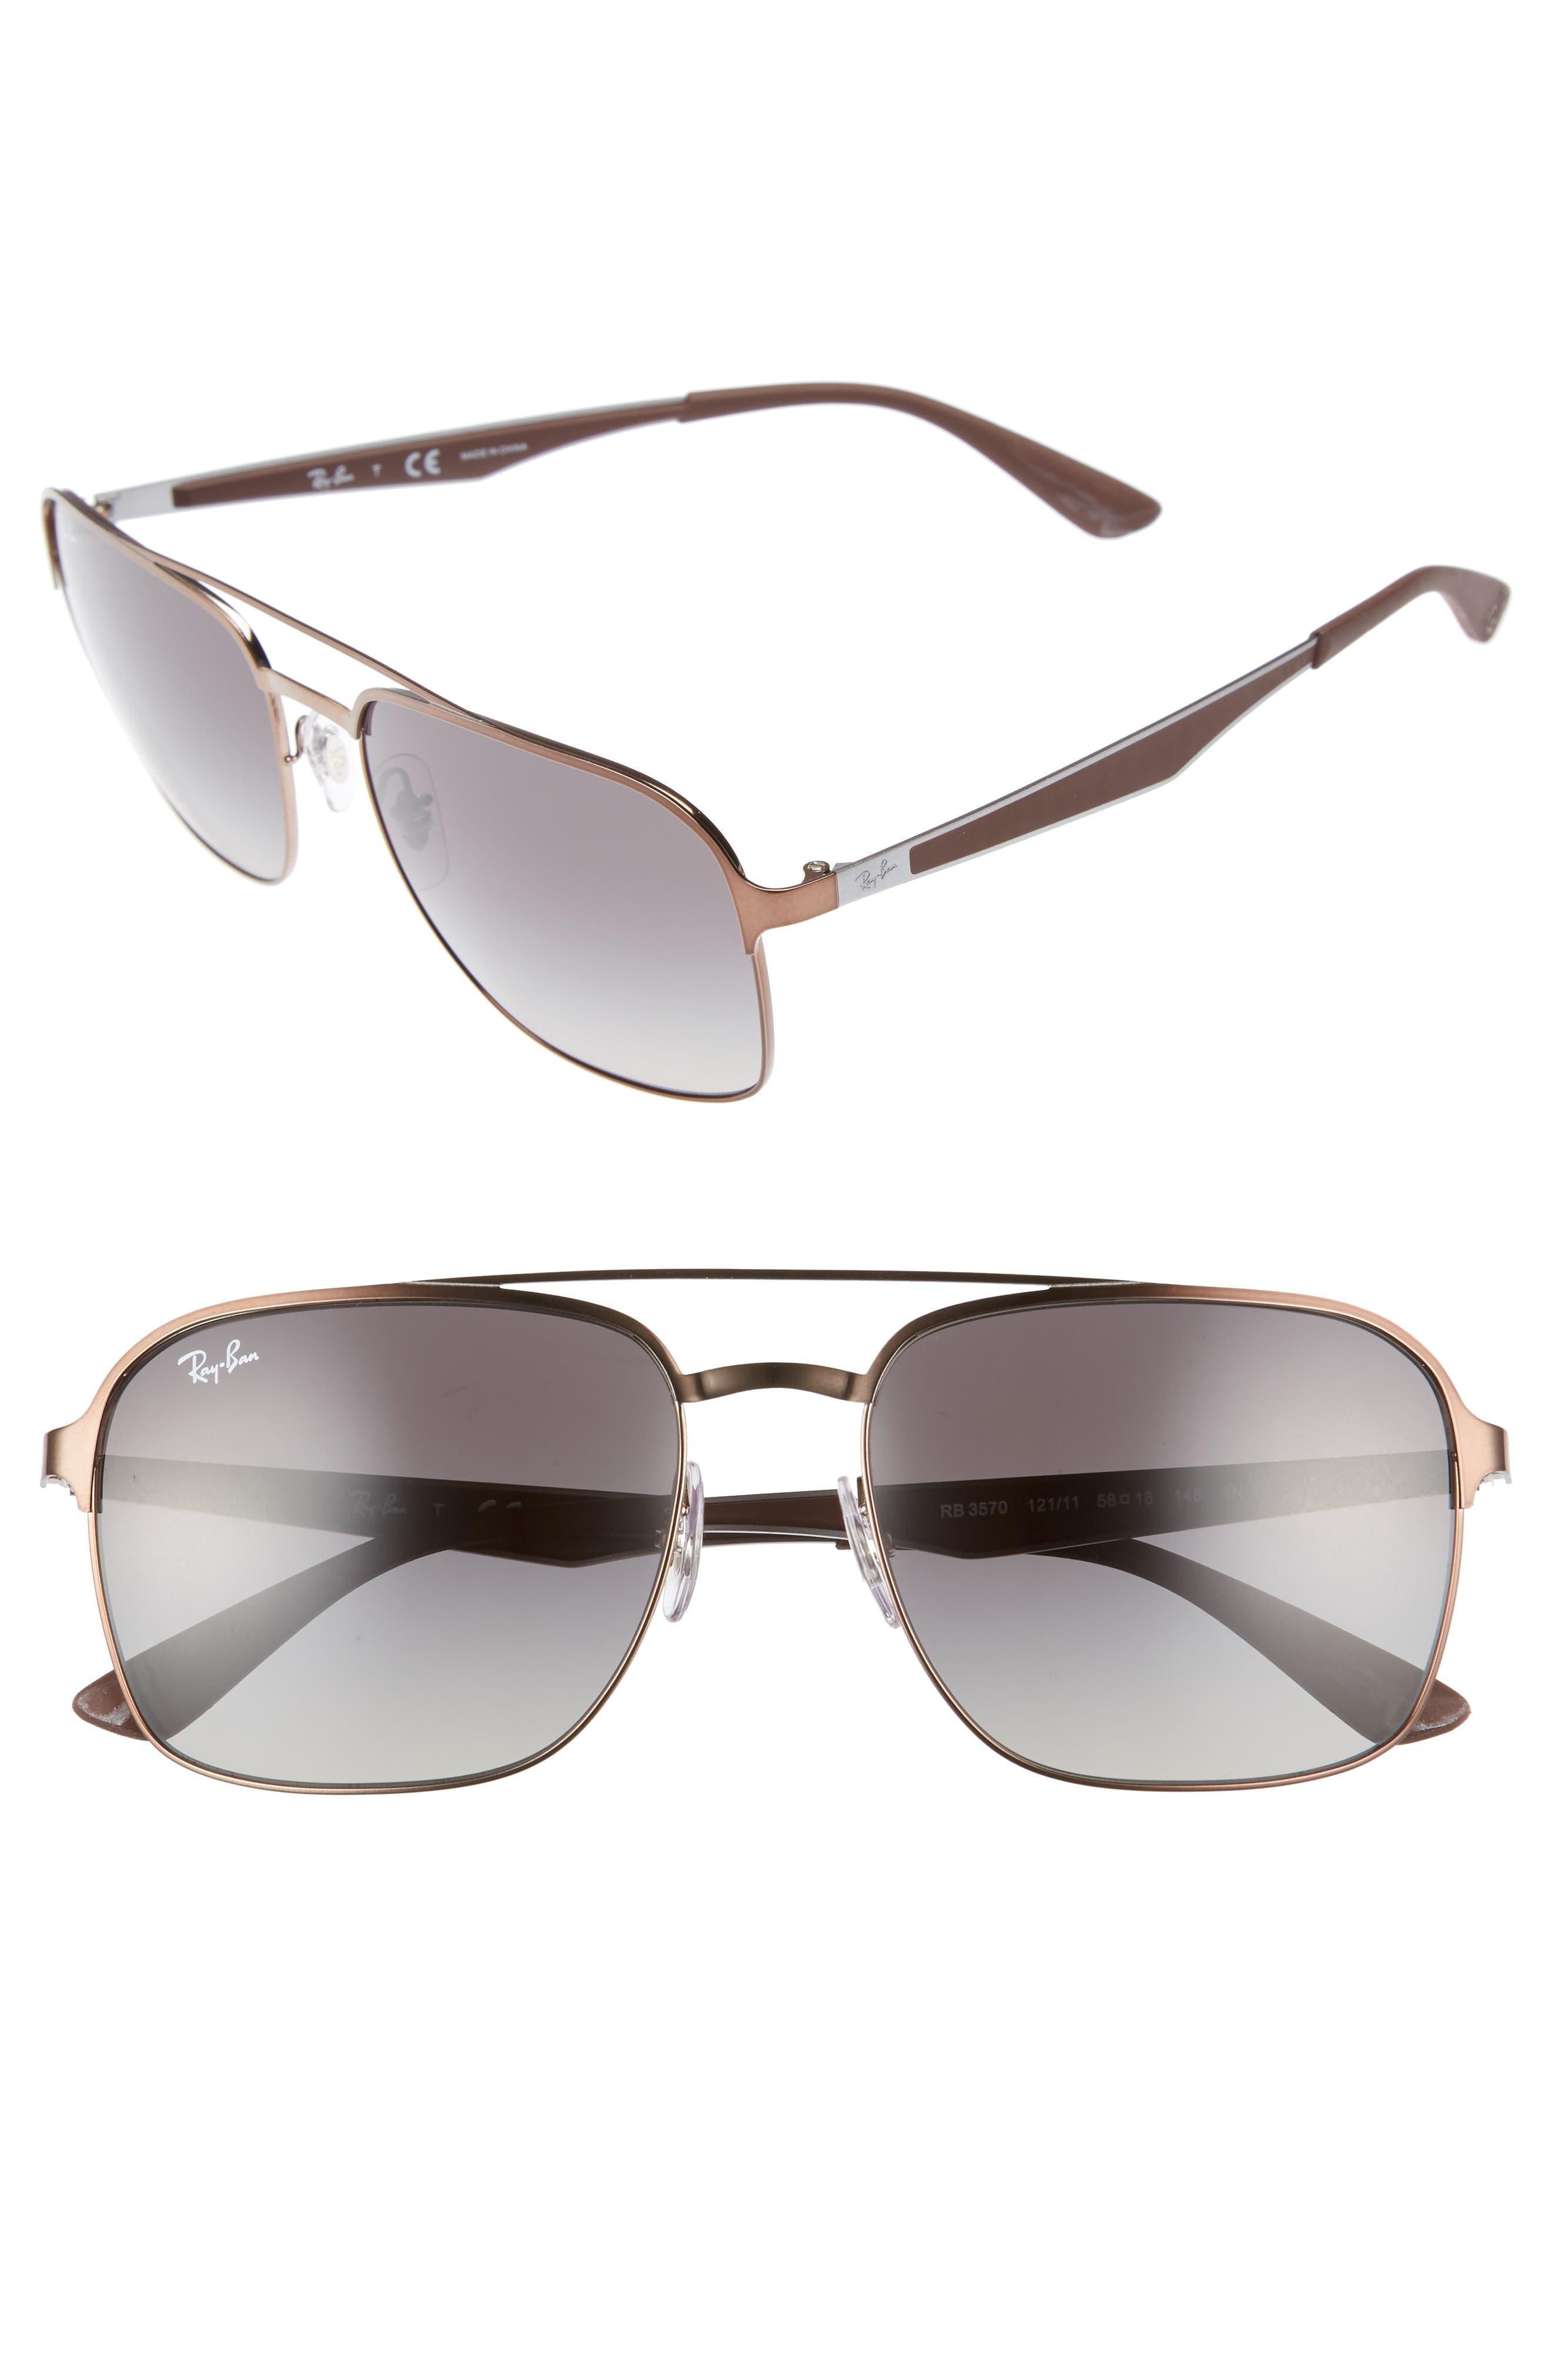 Ray-Ban Retro 58mm Sunglasses